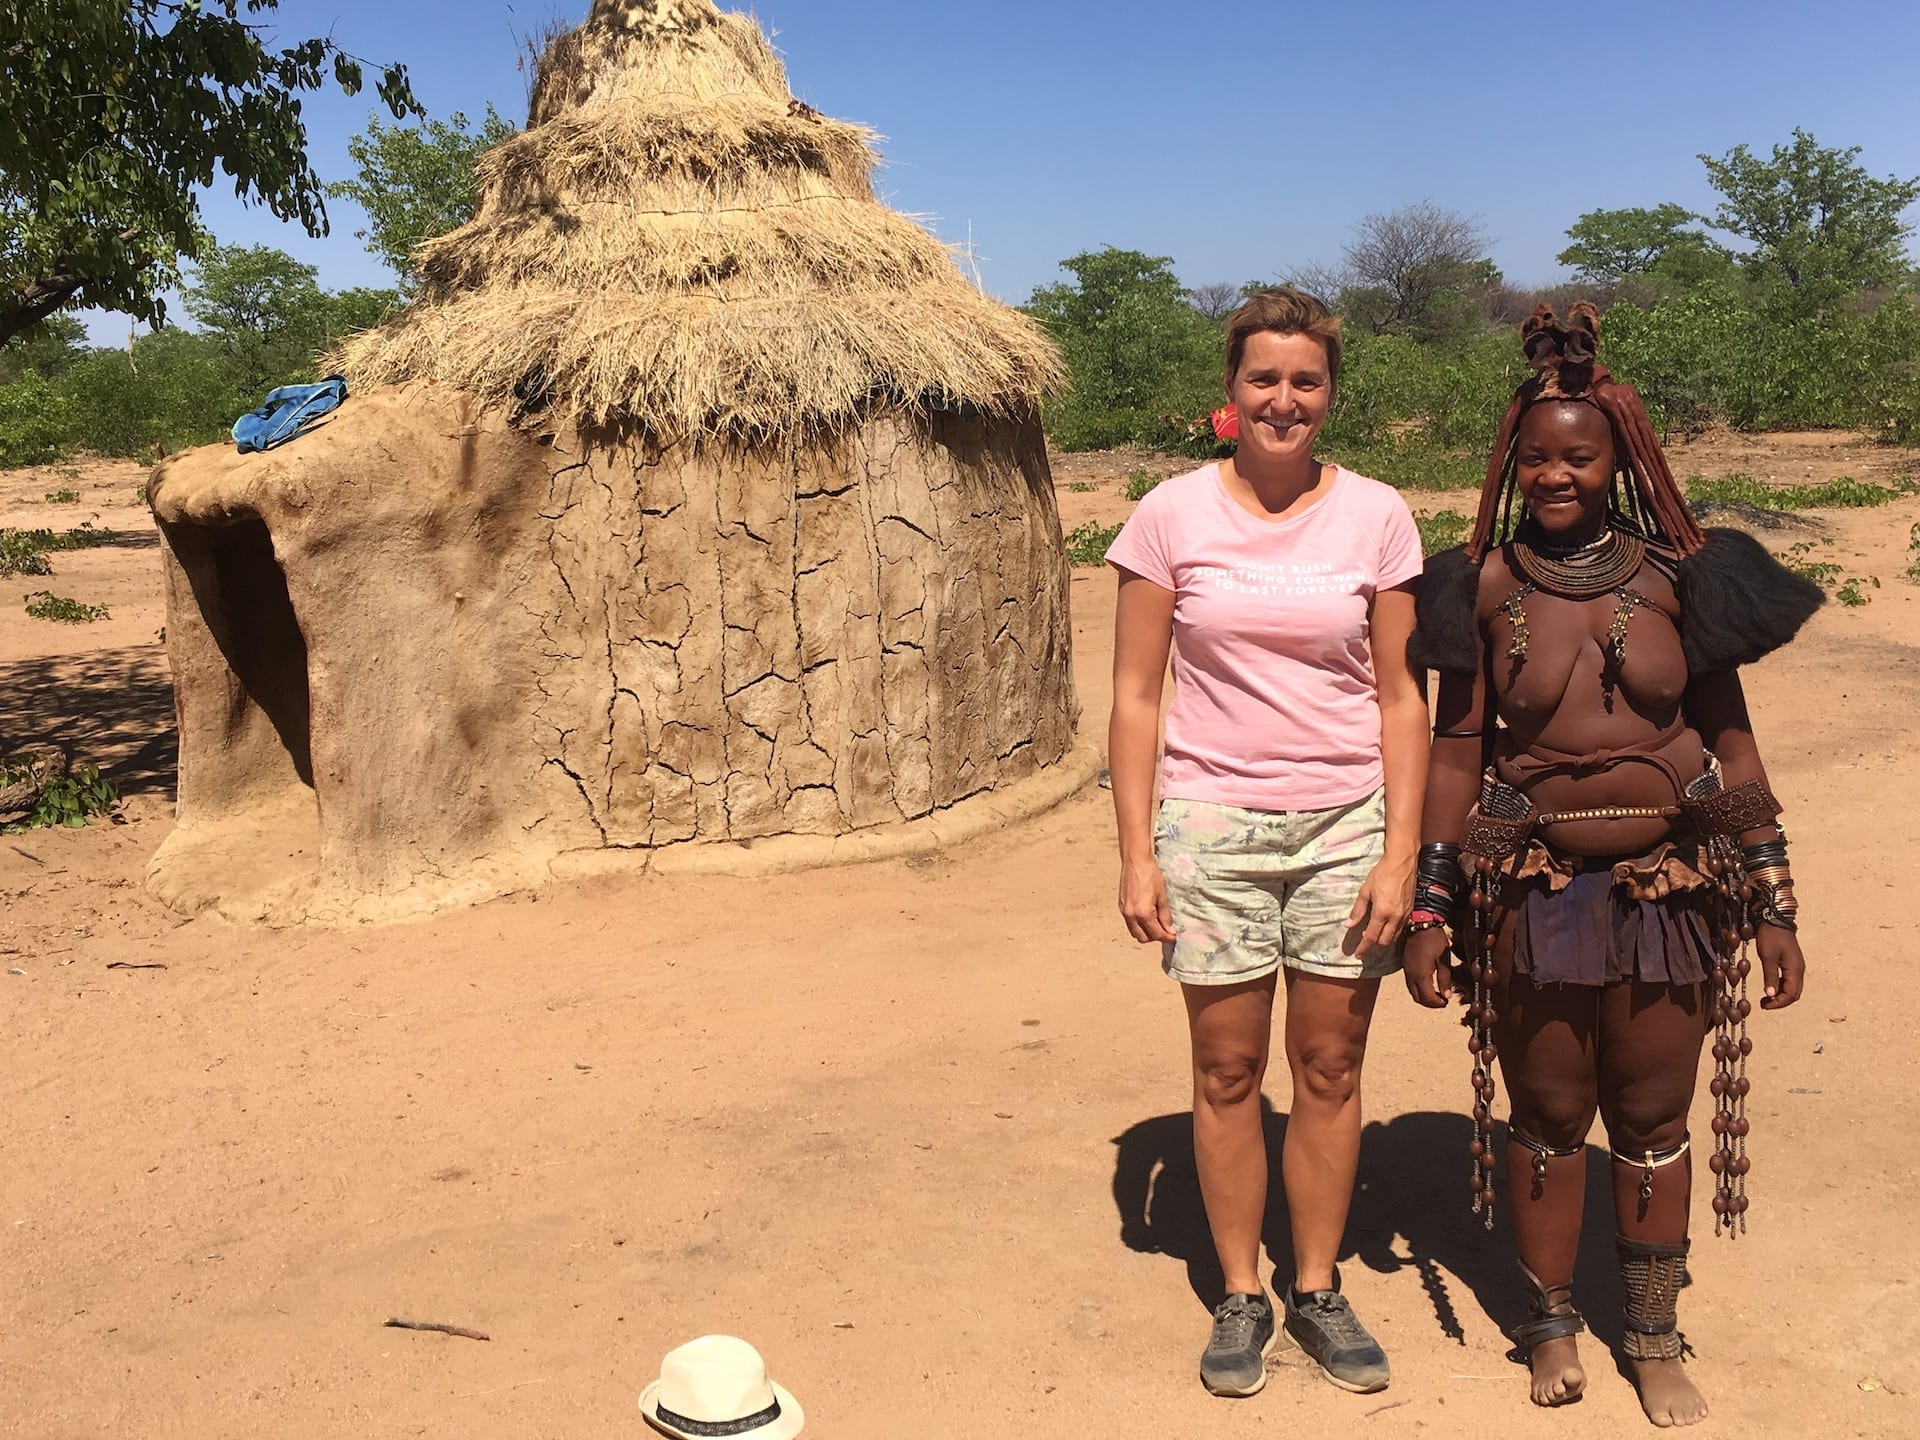 # FOTO - Himba Excursion